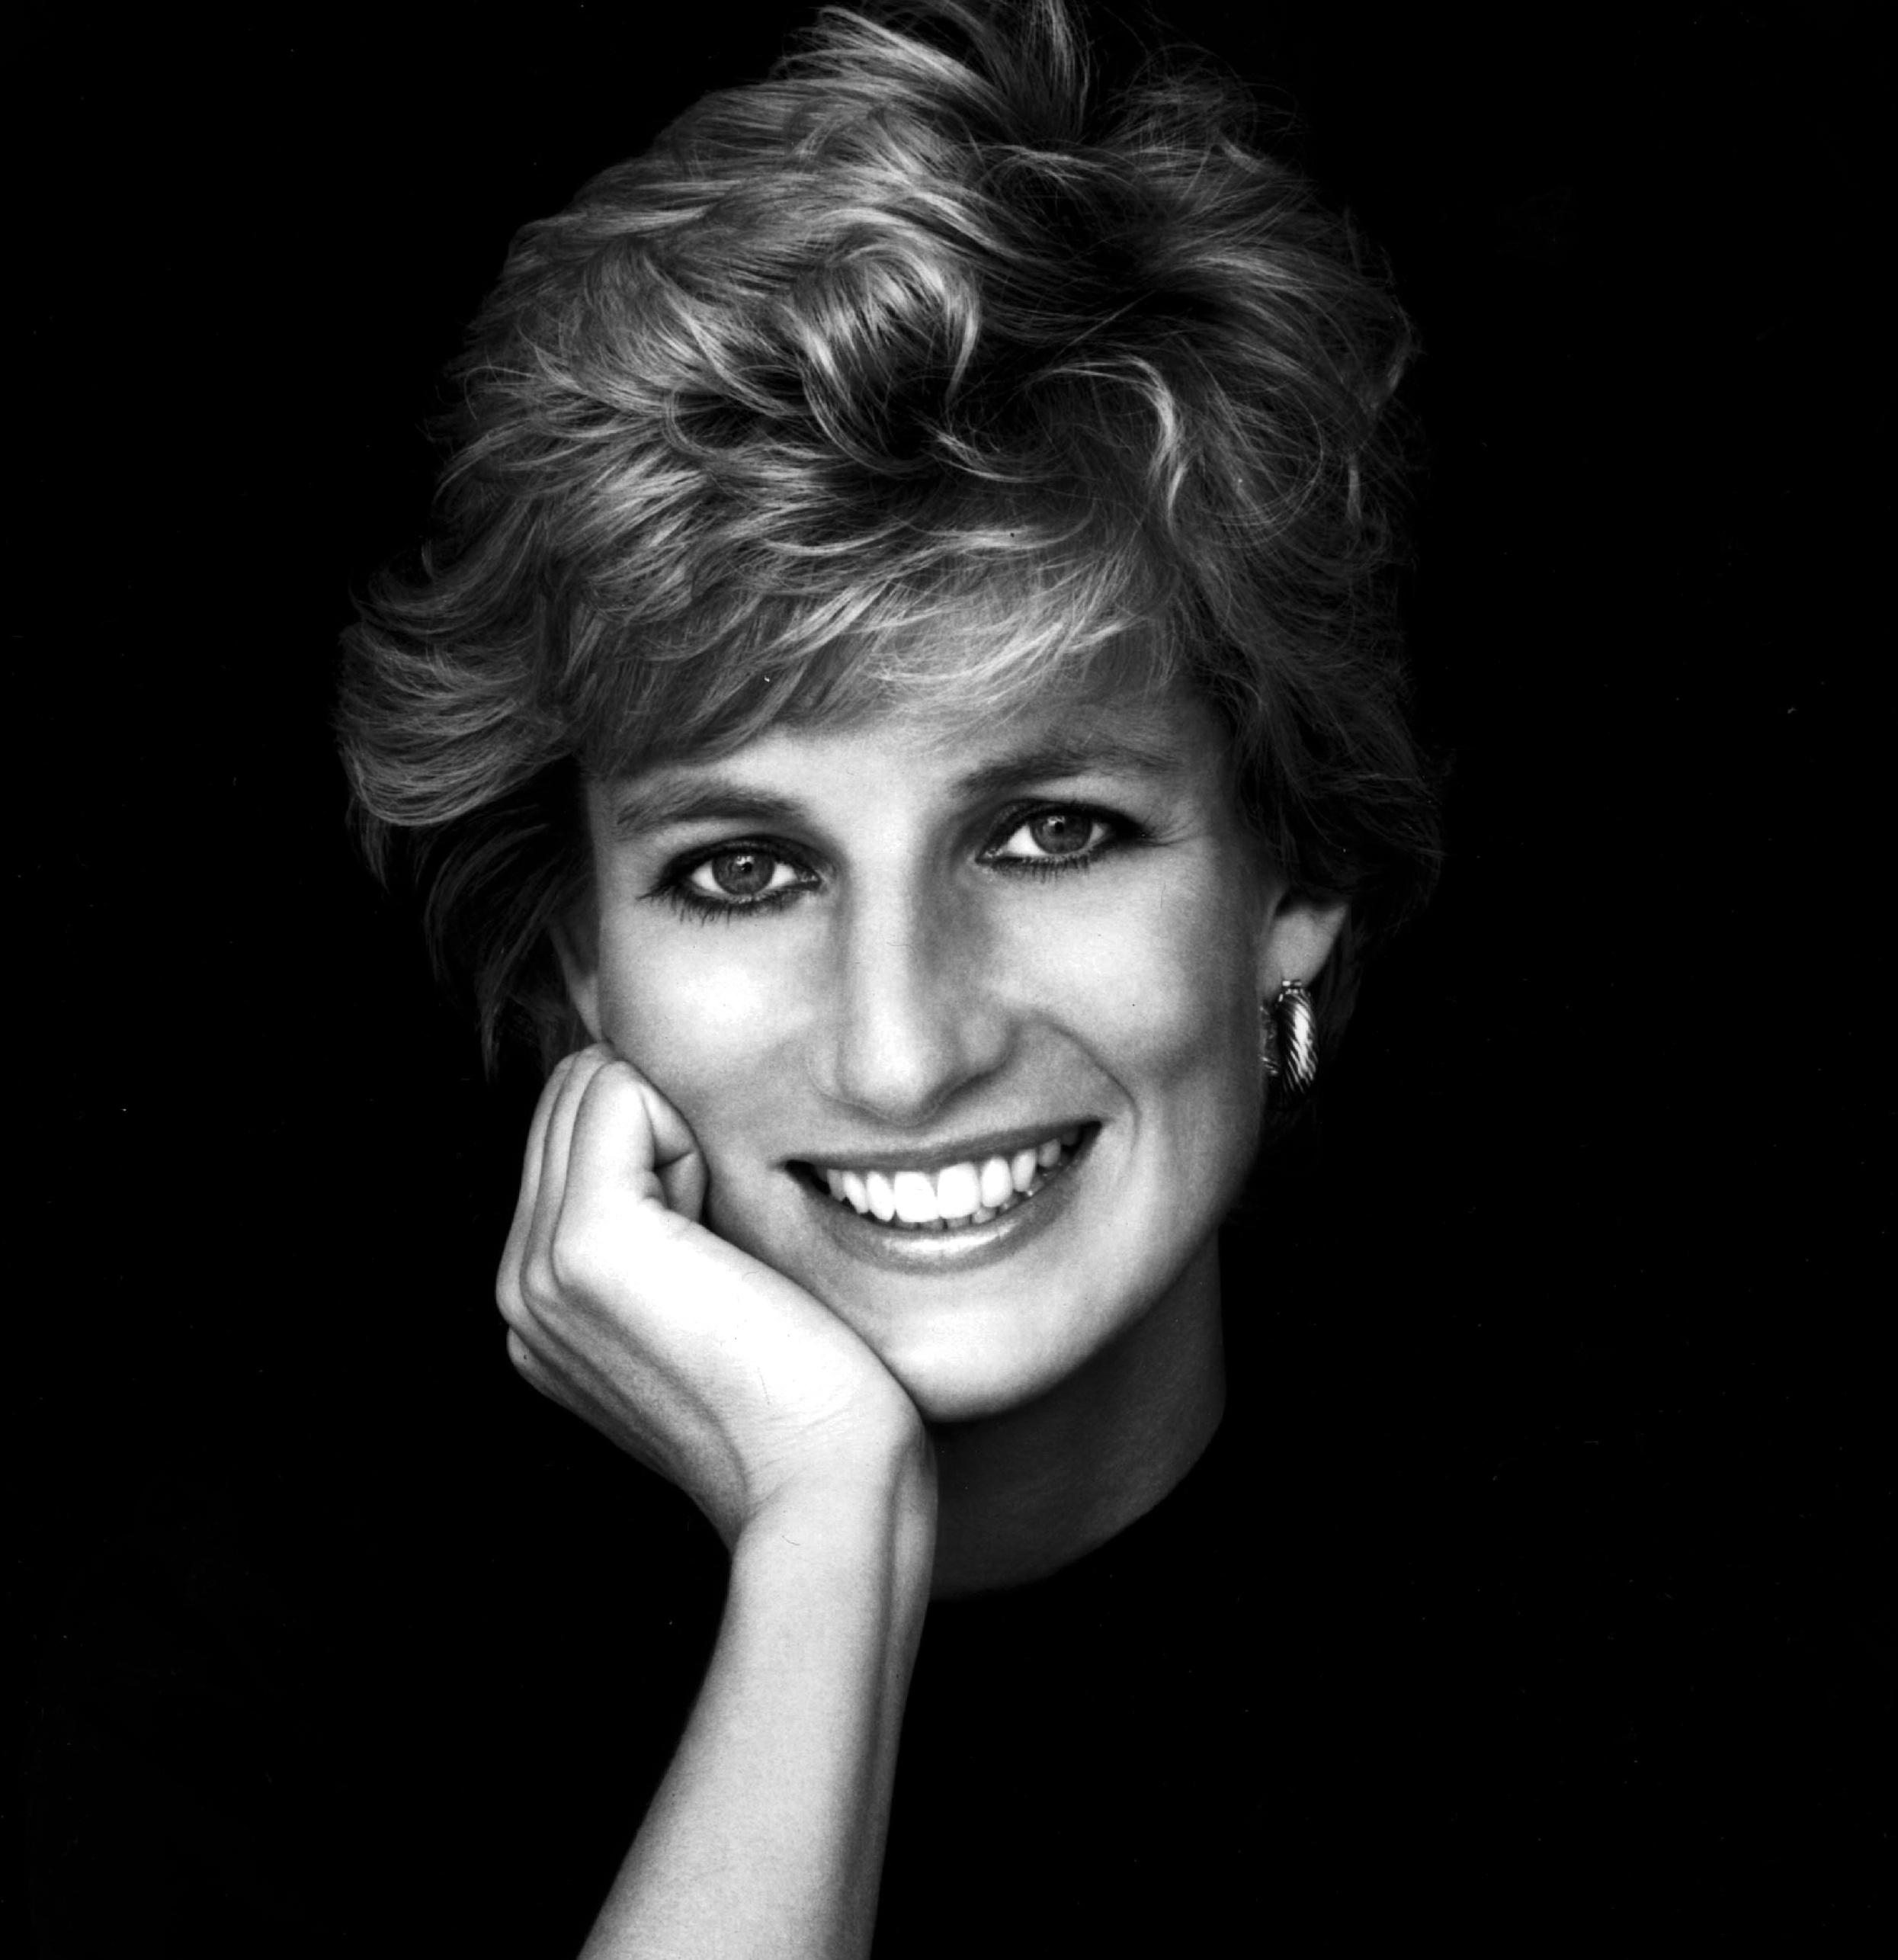 31 augustus 1997 - Prinses Diana verongelukt